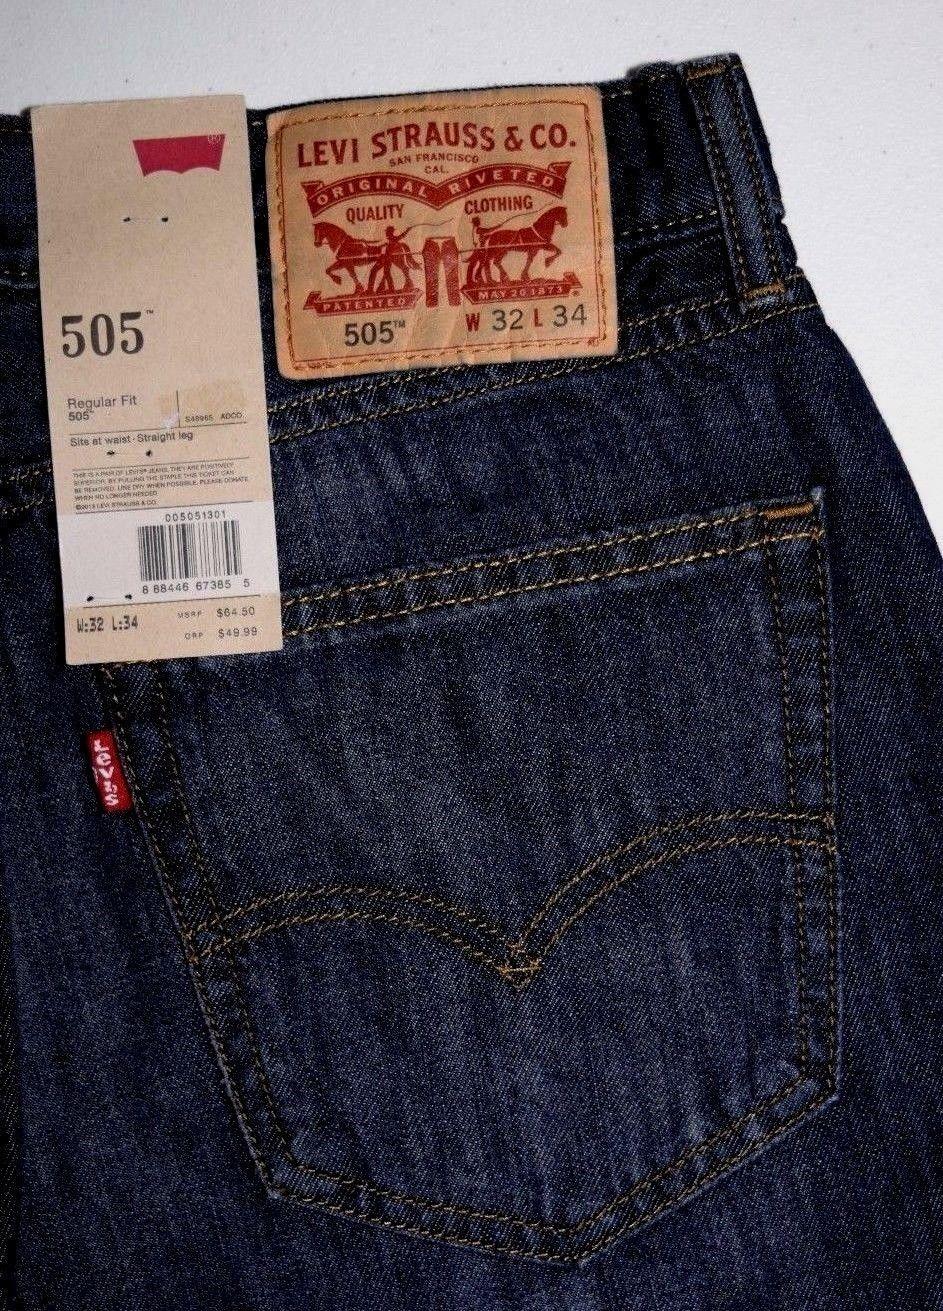 Levi S 505 Regular Fit Mens Jeans Mens Jeans Fit Mens Jeans Men Jeans Relaxed